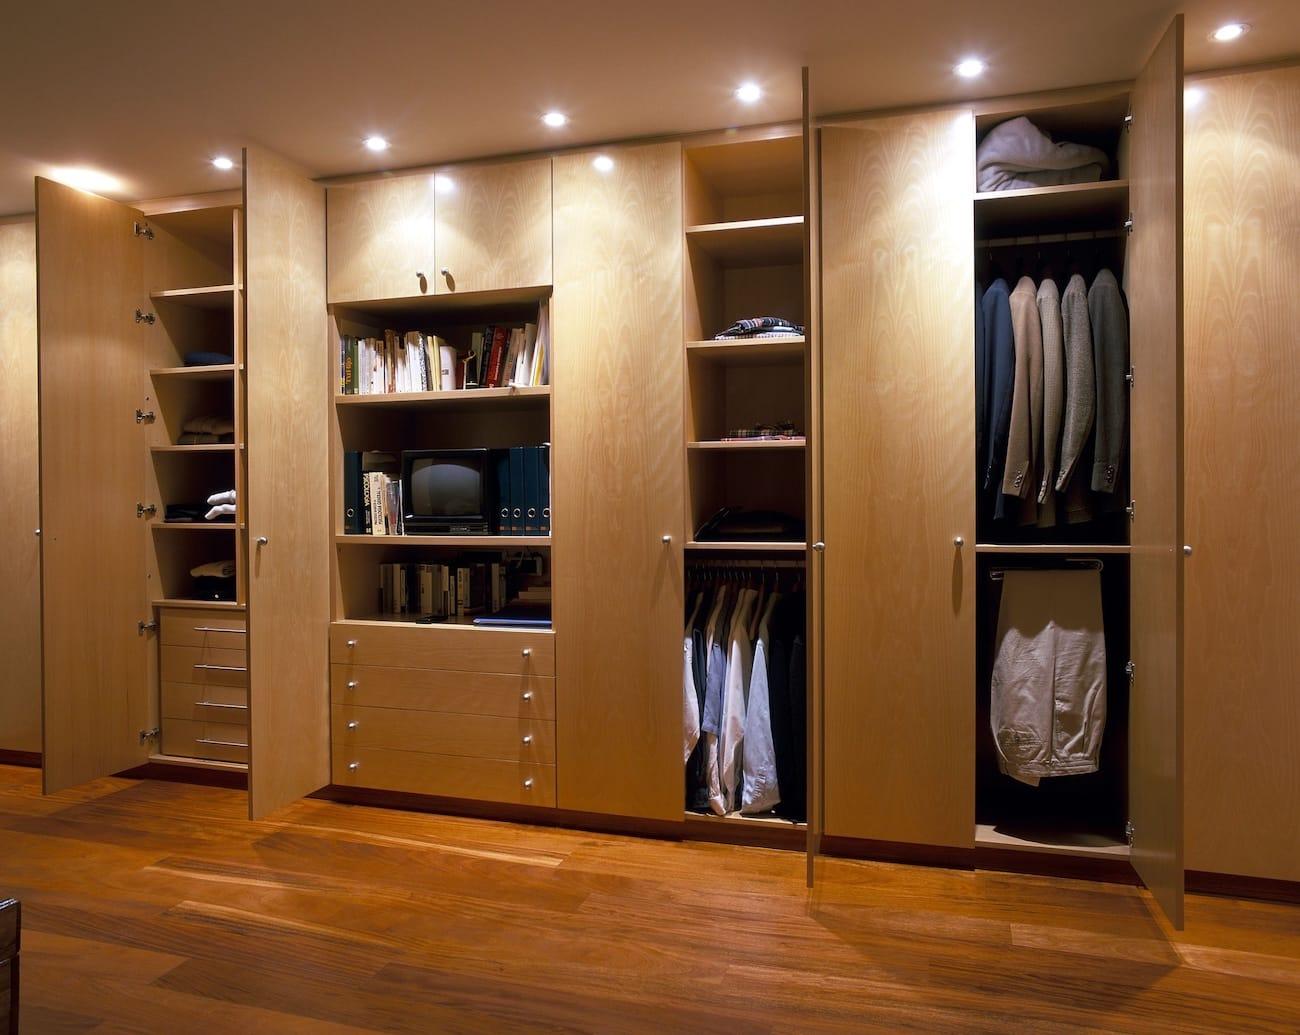 Los Angeles Reach In Closets Custom Designed Amp Built